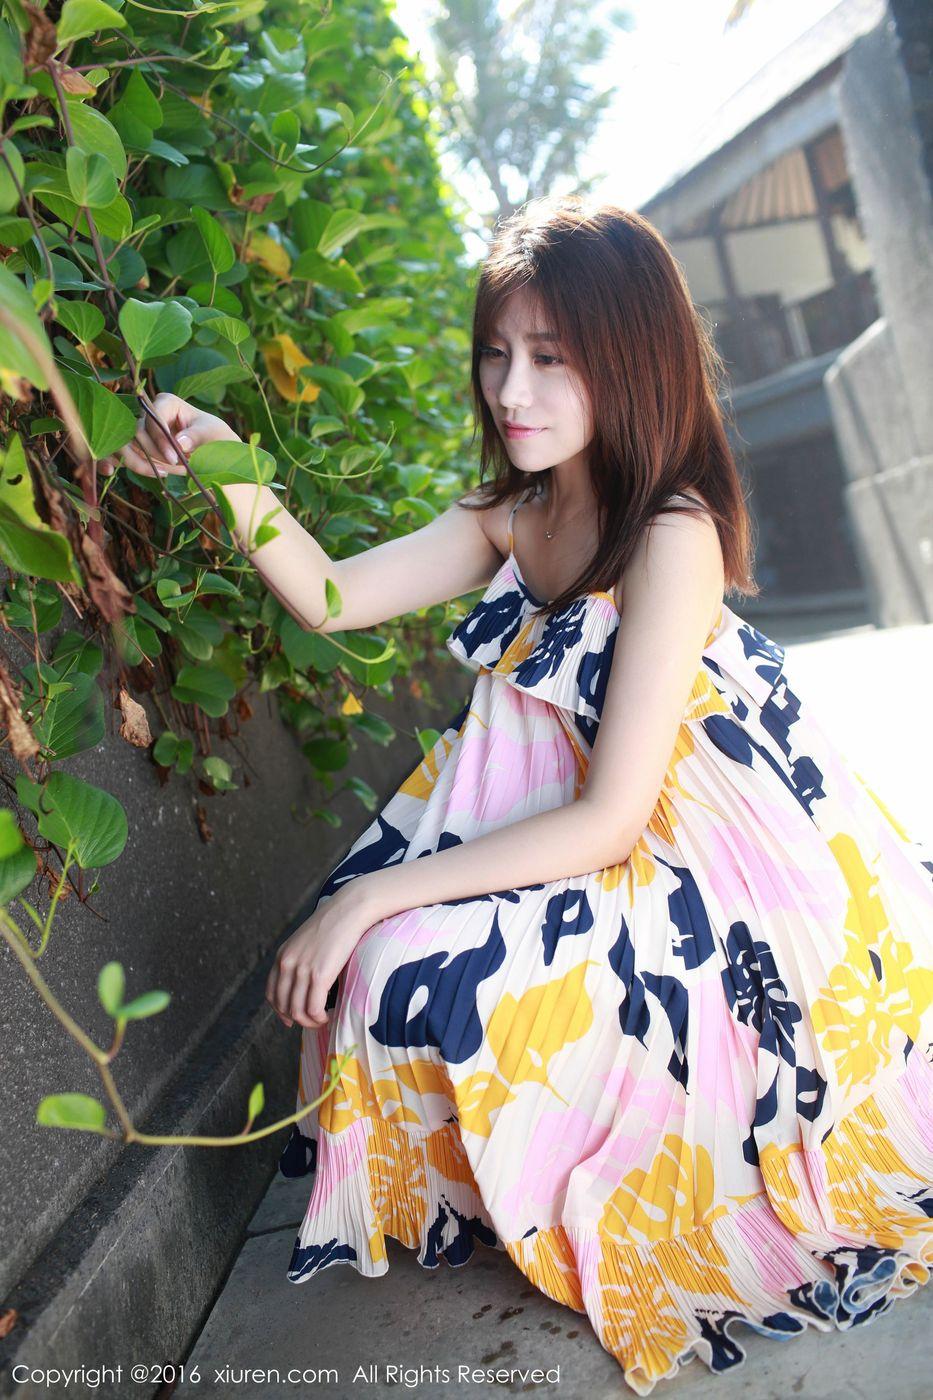 [XiuRen秀人网] 清纯美女许诺Sabrina长裙美腿巴厘岛户外旅拍 No.542